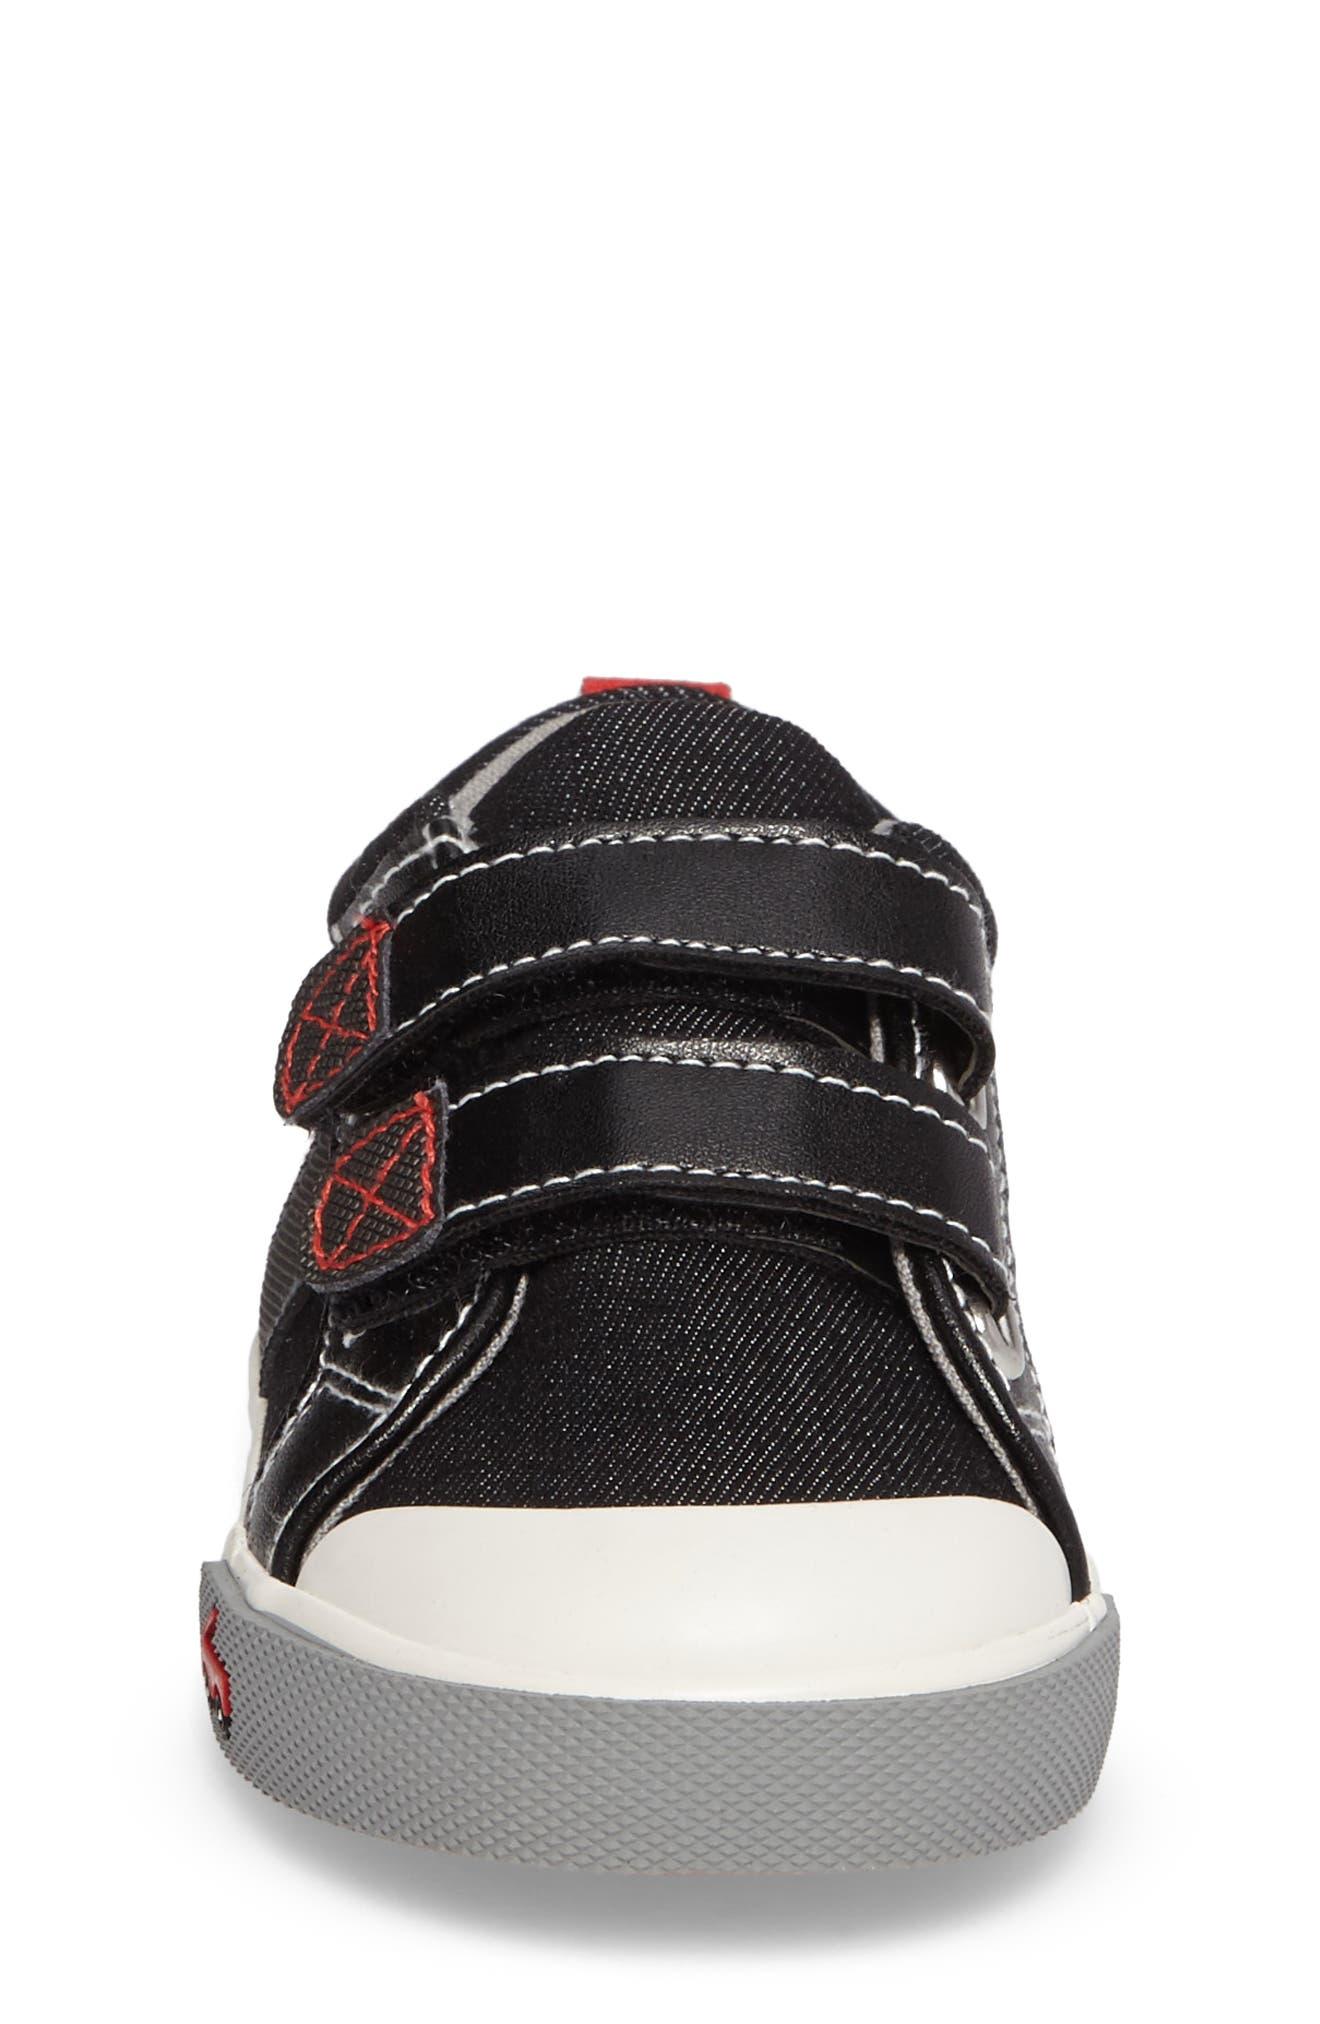 'Russell' Sneaker,                             Alternate thumbnail 4, color,                             003